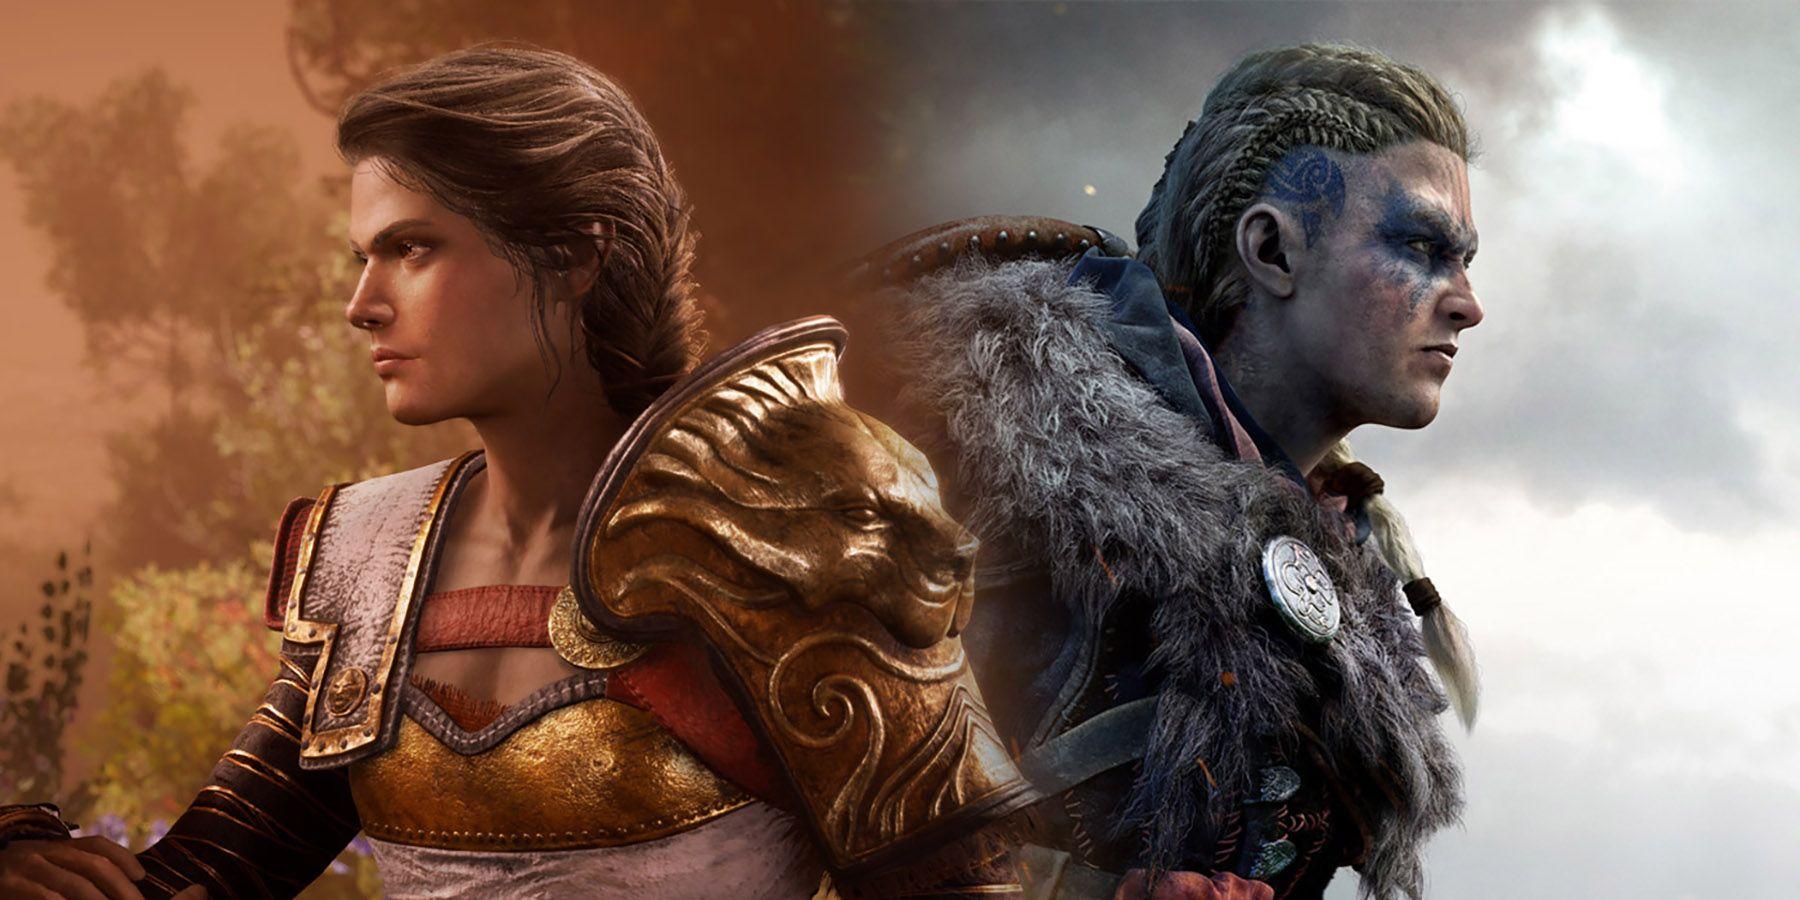 Assassin's Creed Odyssey vs. Valhalla: Kassandra is More of an Assassin than Eivor